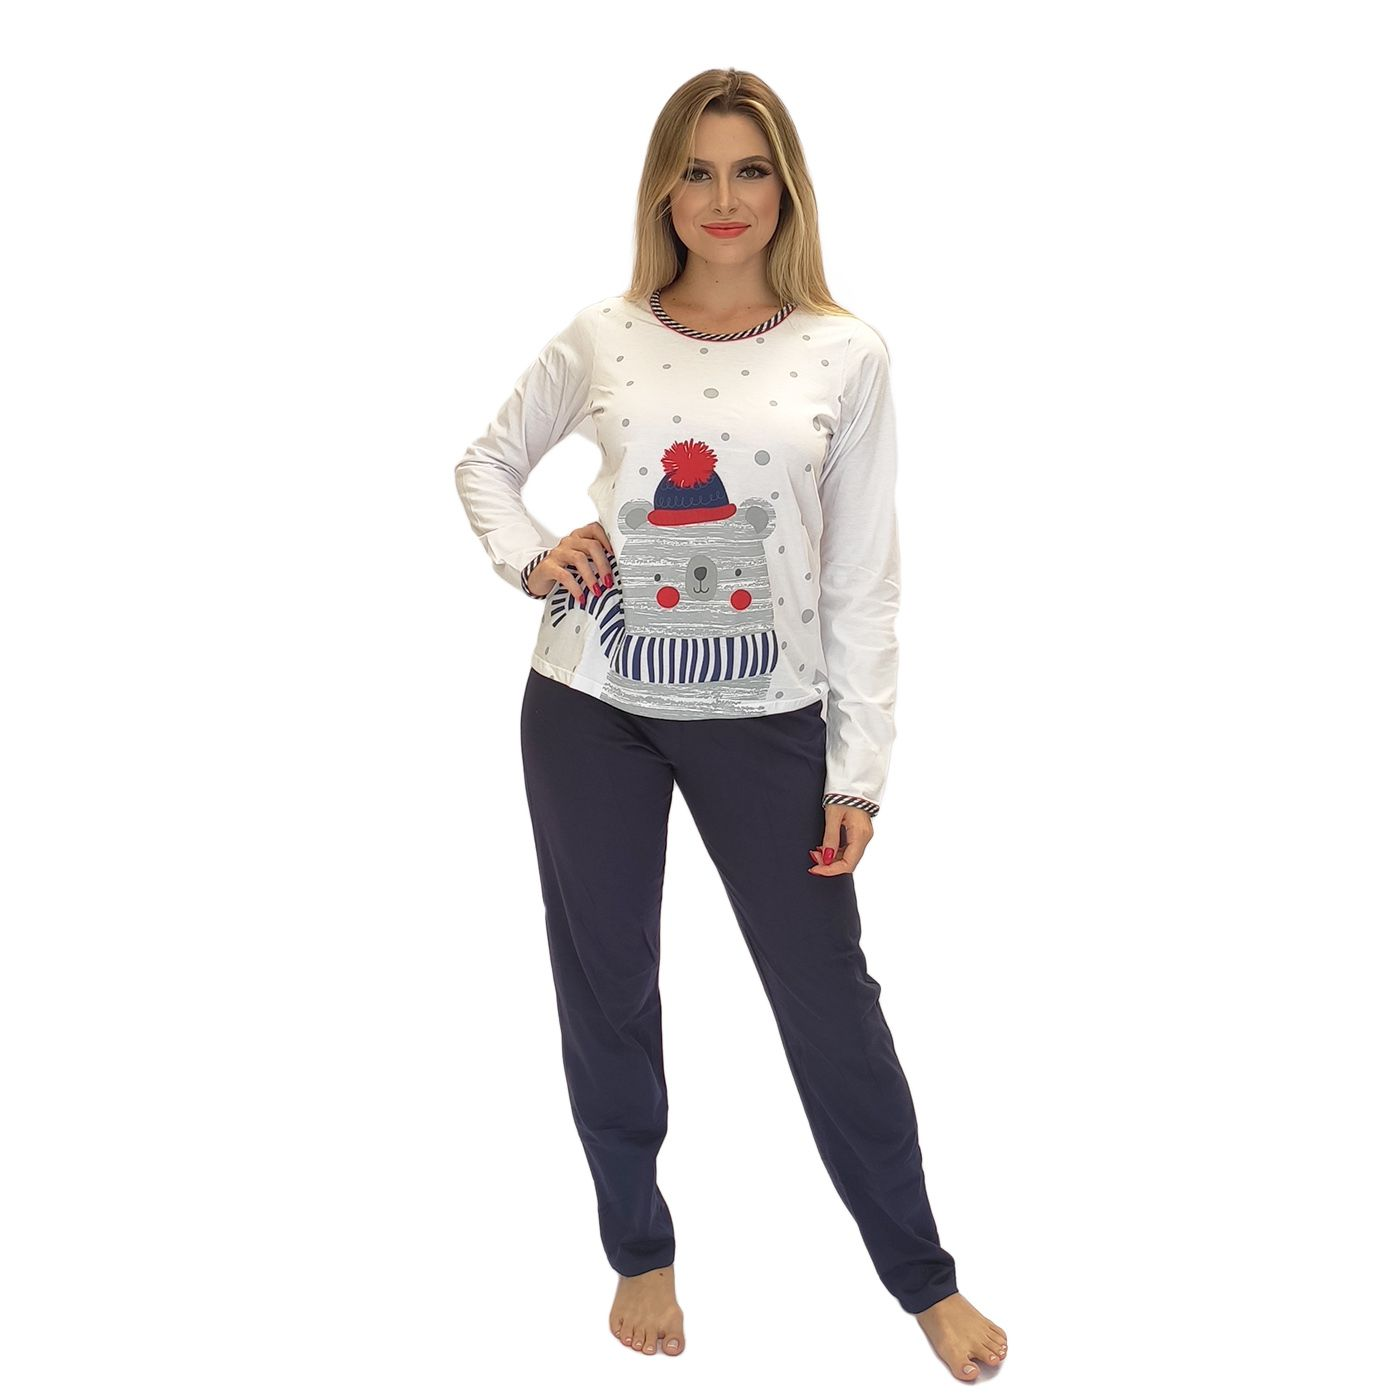 Pijama feminino inverno ursinho algodão super macio